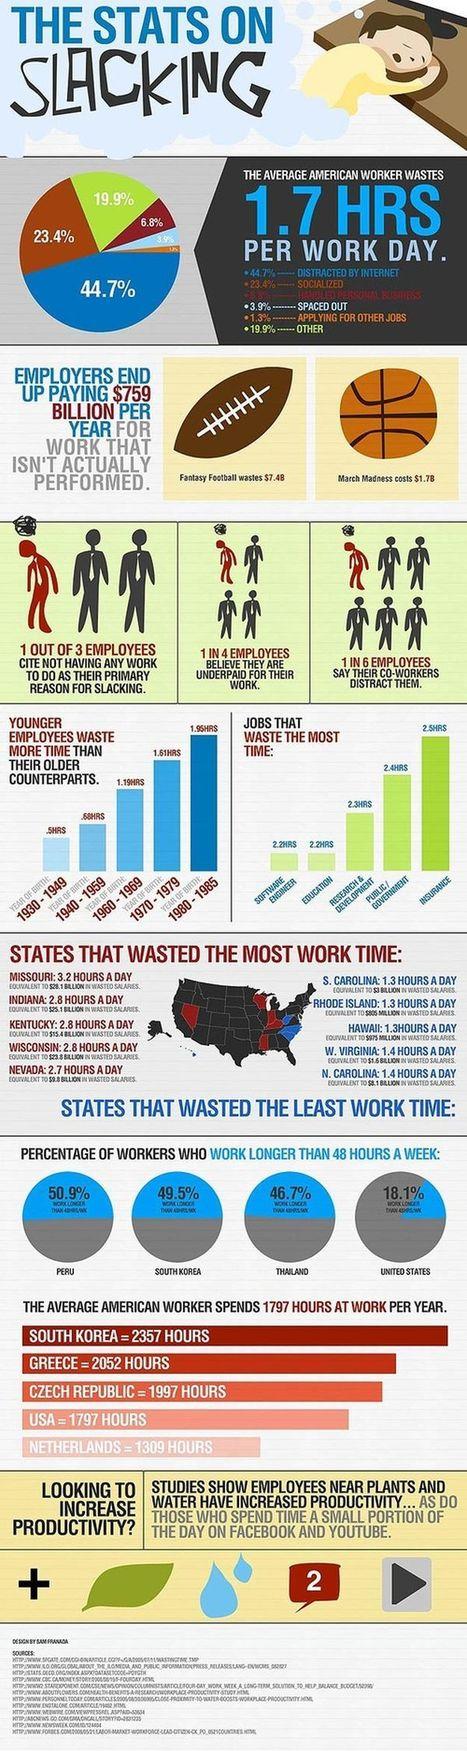 Americans waste 1.7 hours per day at work, Kristin Piombino Ragan | Employer Branding News | Scoop.it